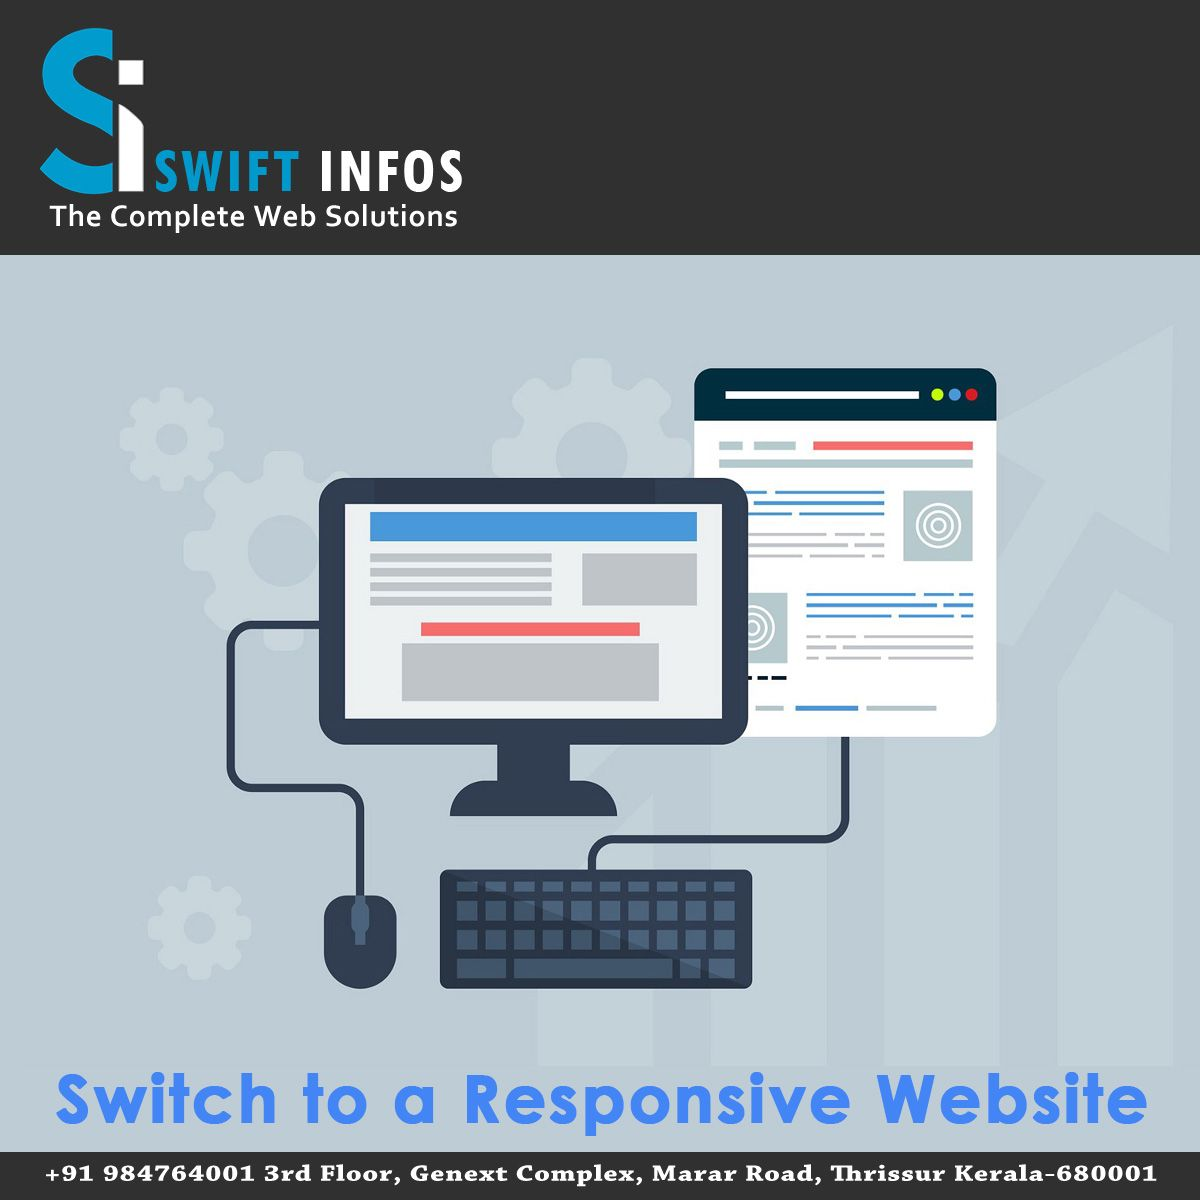 Www Swiftinfos Com Switch To A Responsive Website With Swiftinfos Make Your Website L Website Development Company Web Development Design Web Design Company